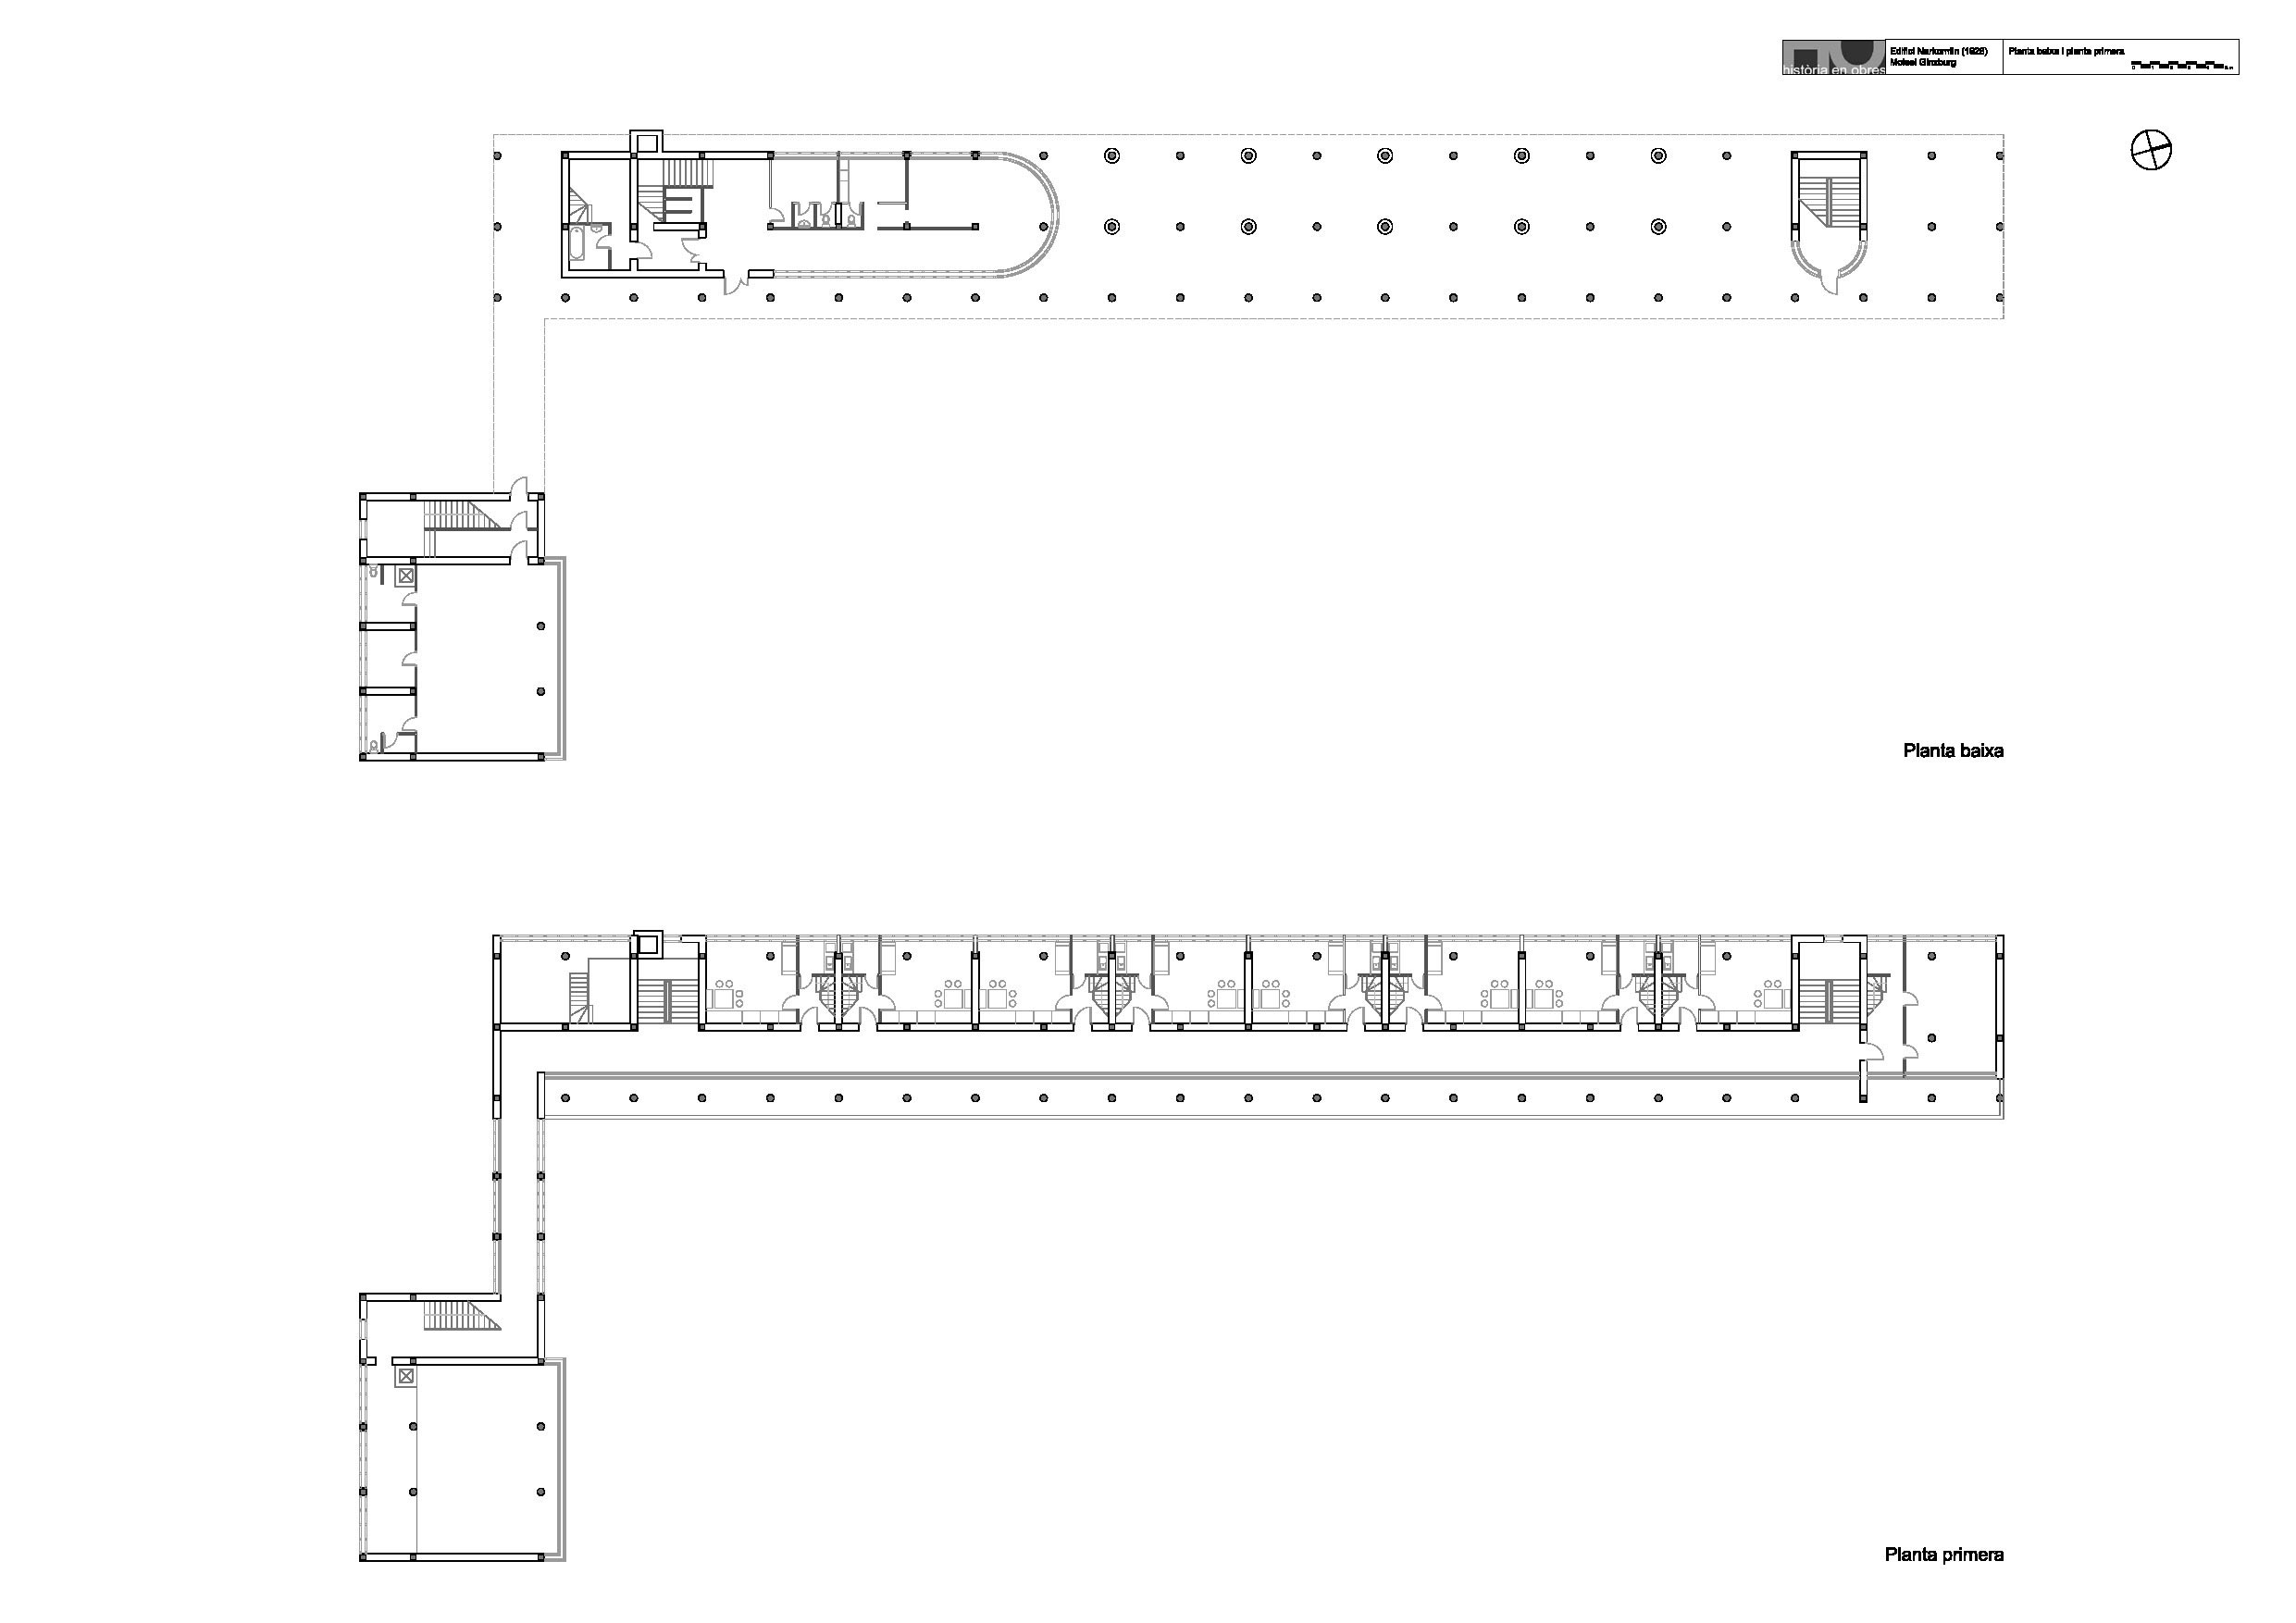 narkomfin-01-plans-1